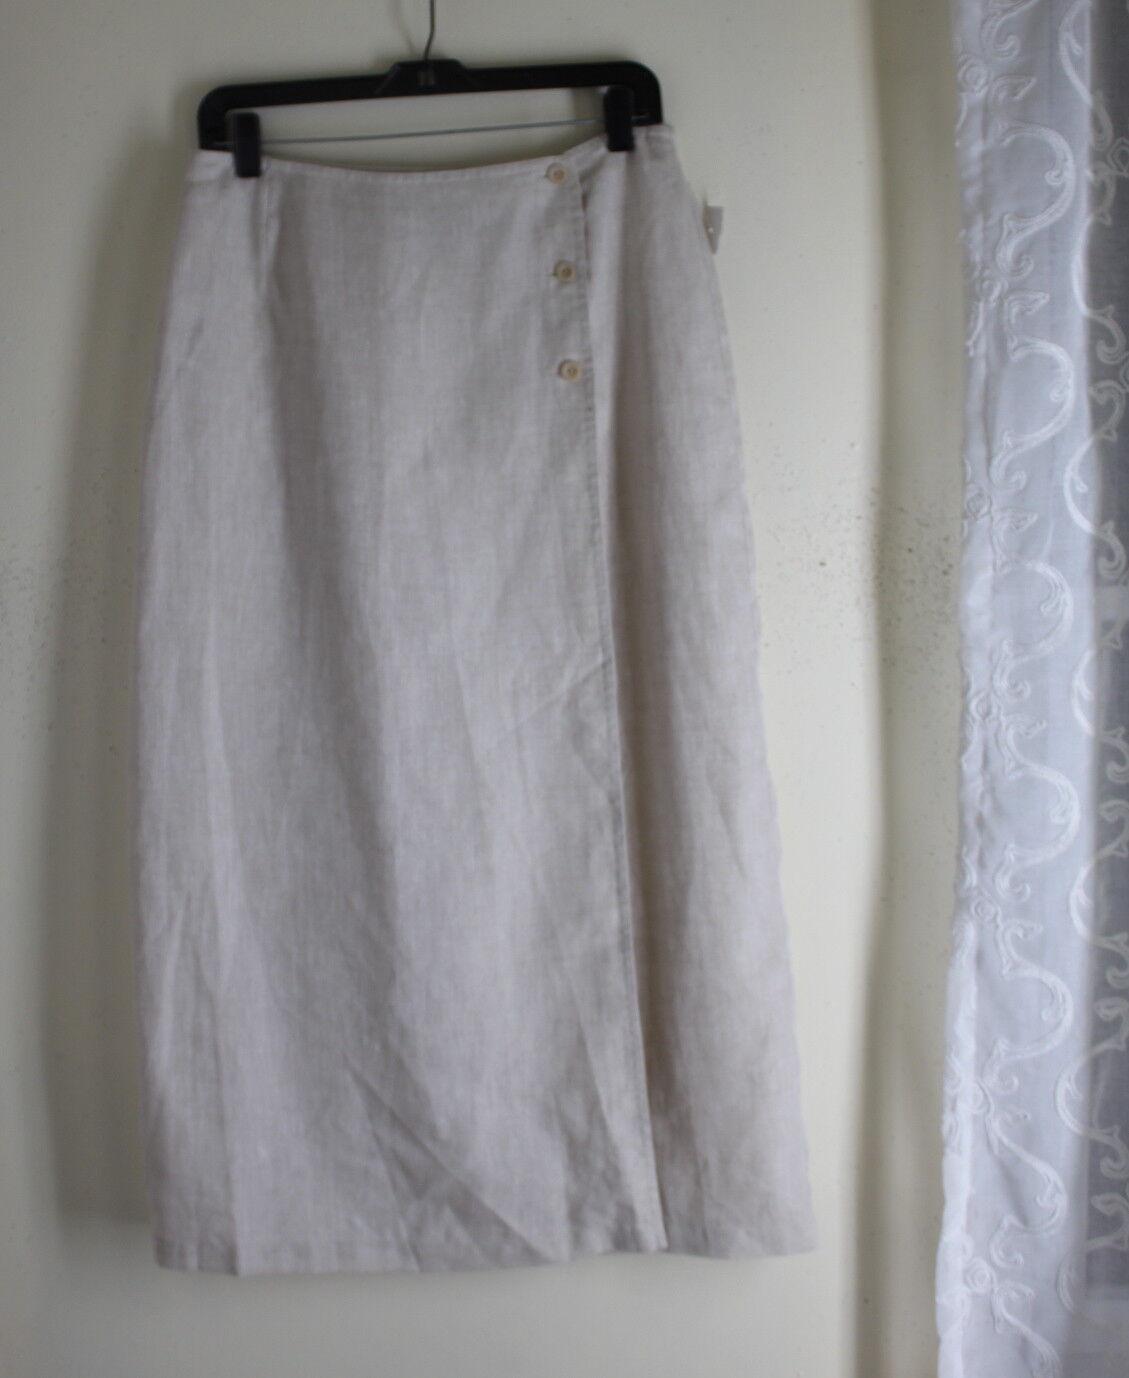 NEW Liz Claiborne -Sz 12 Rustic Lagenlook French Natural Linen Long Wrap Skirt